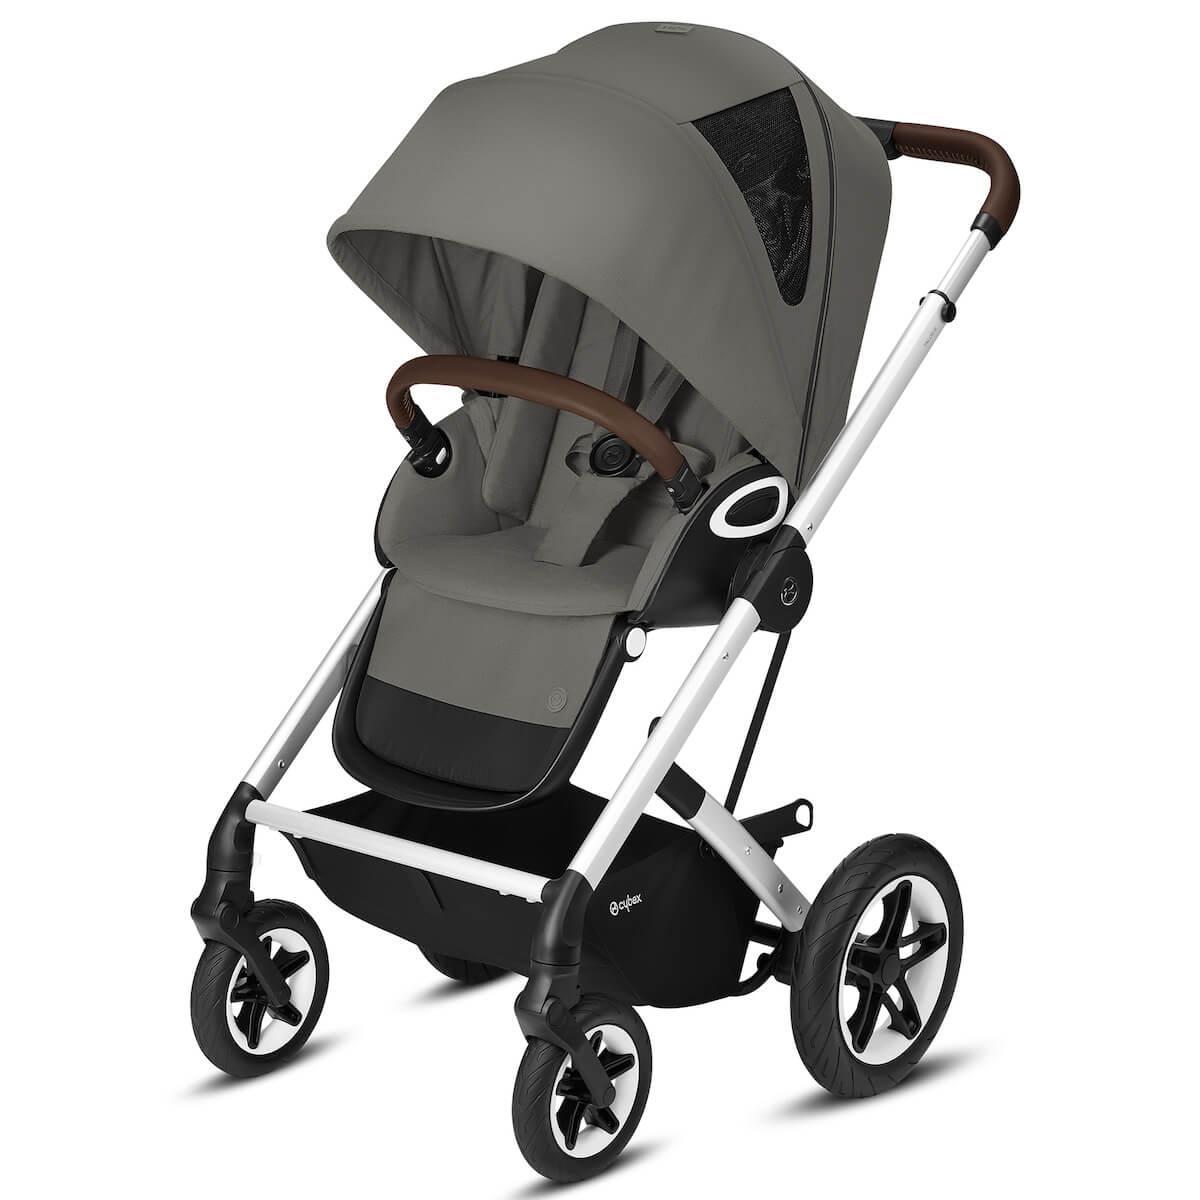 Kinderwagen TALOS S LUX SLV Cybex Soho grey-mid grey